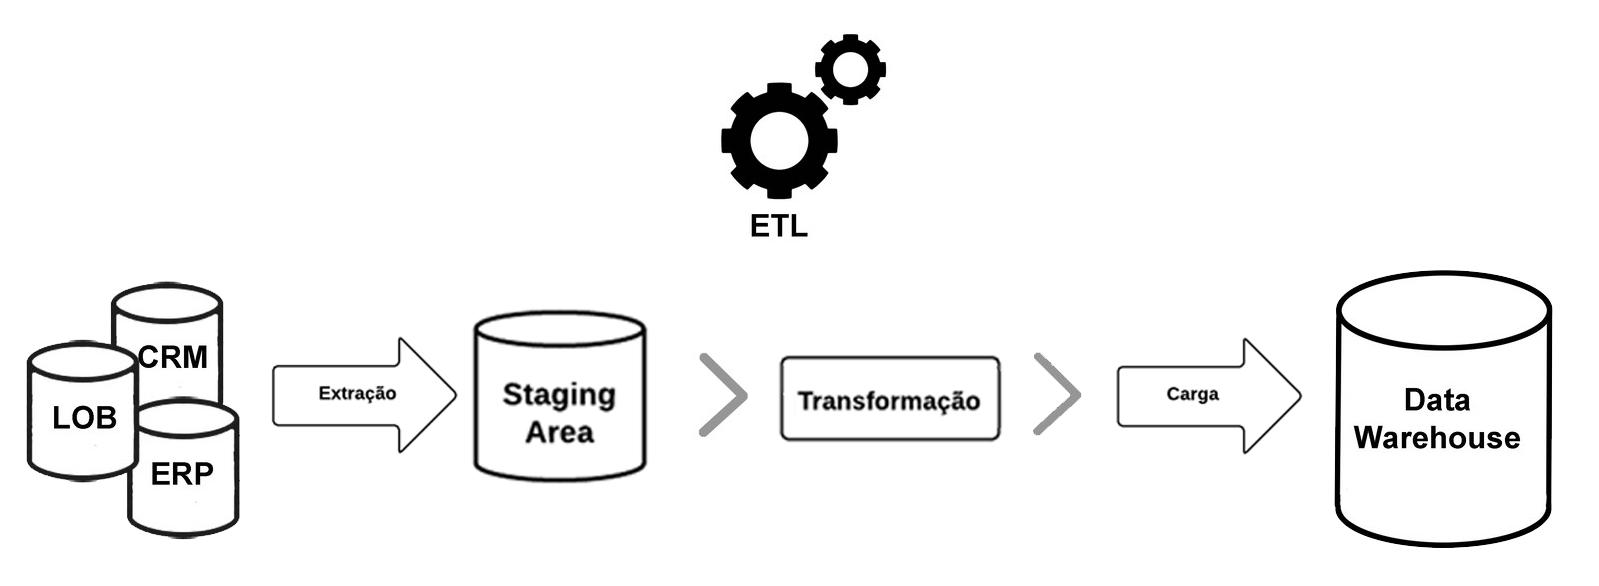 processo de etl